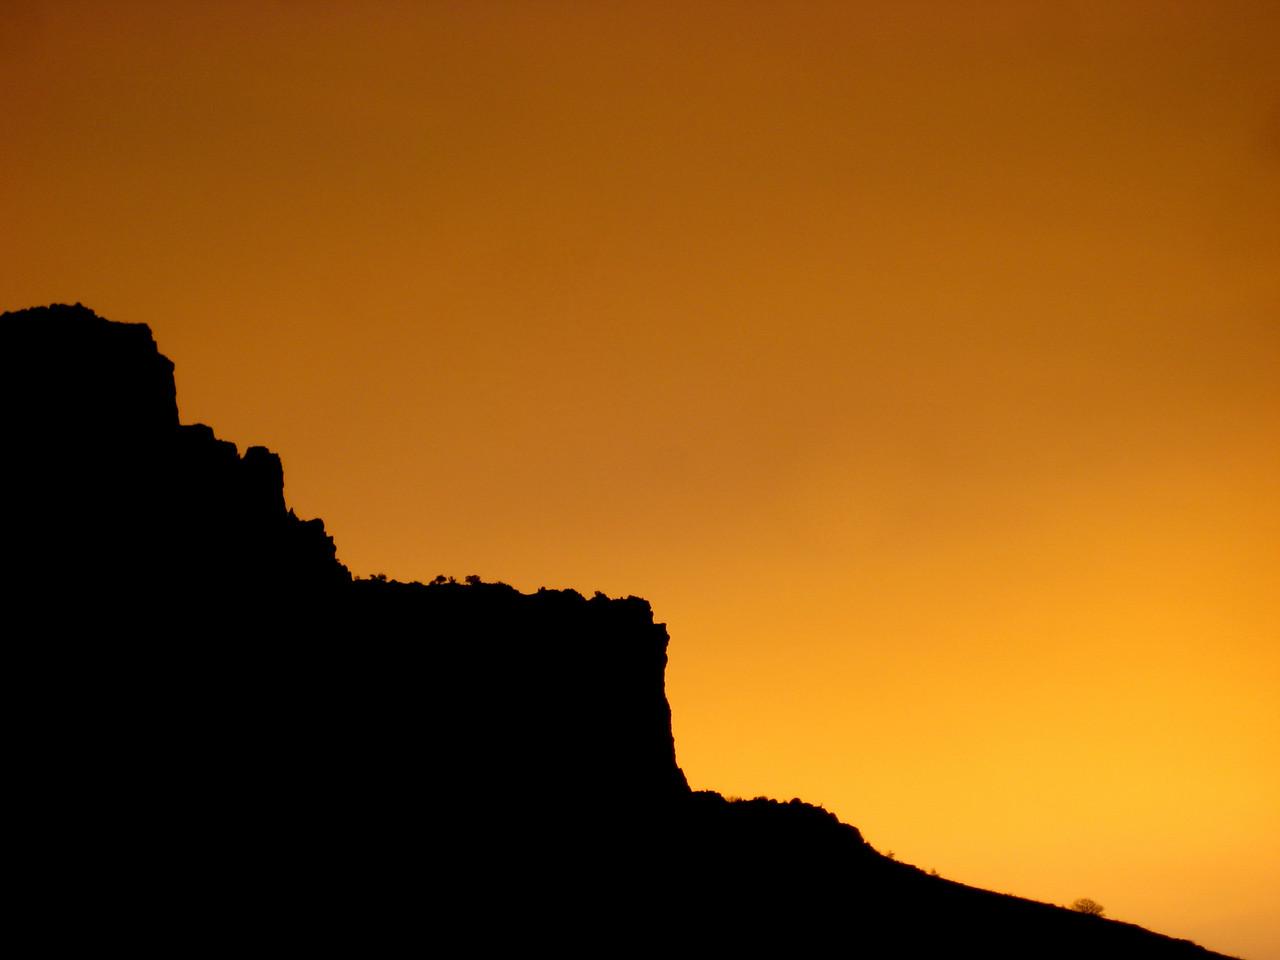 Sunrise Silhouette